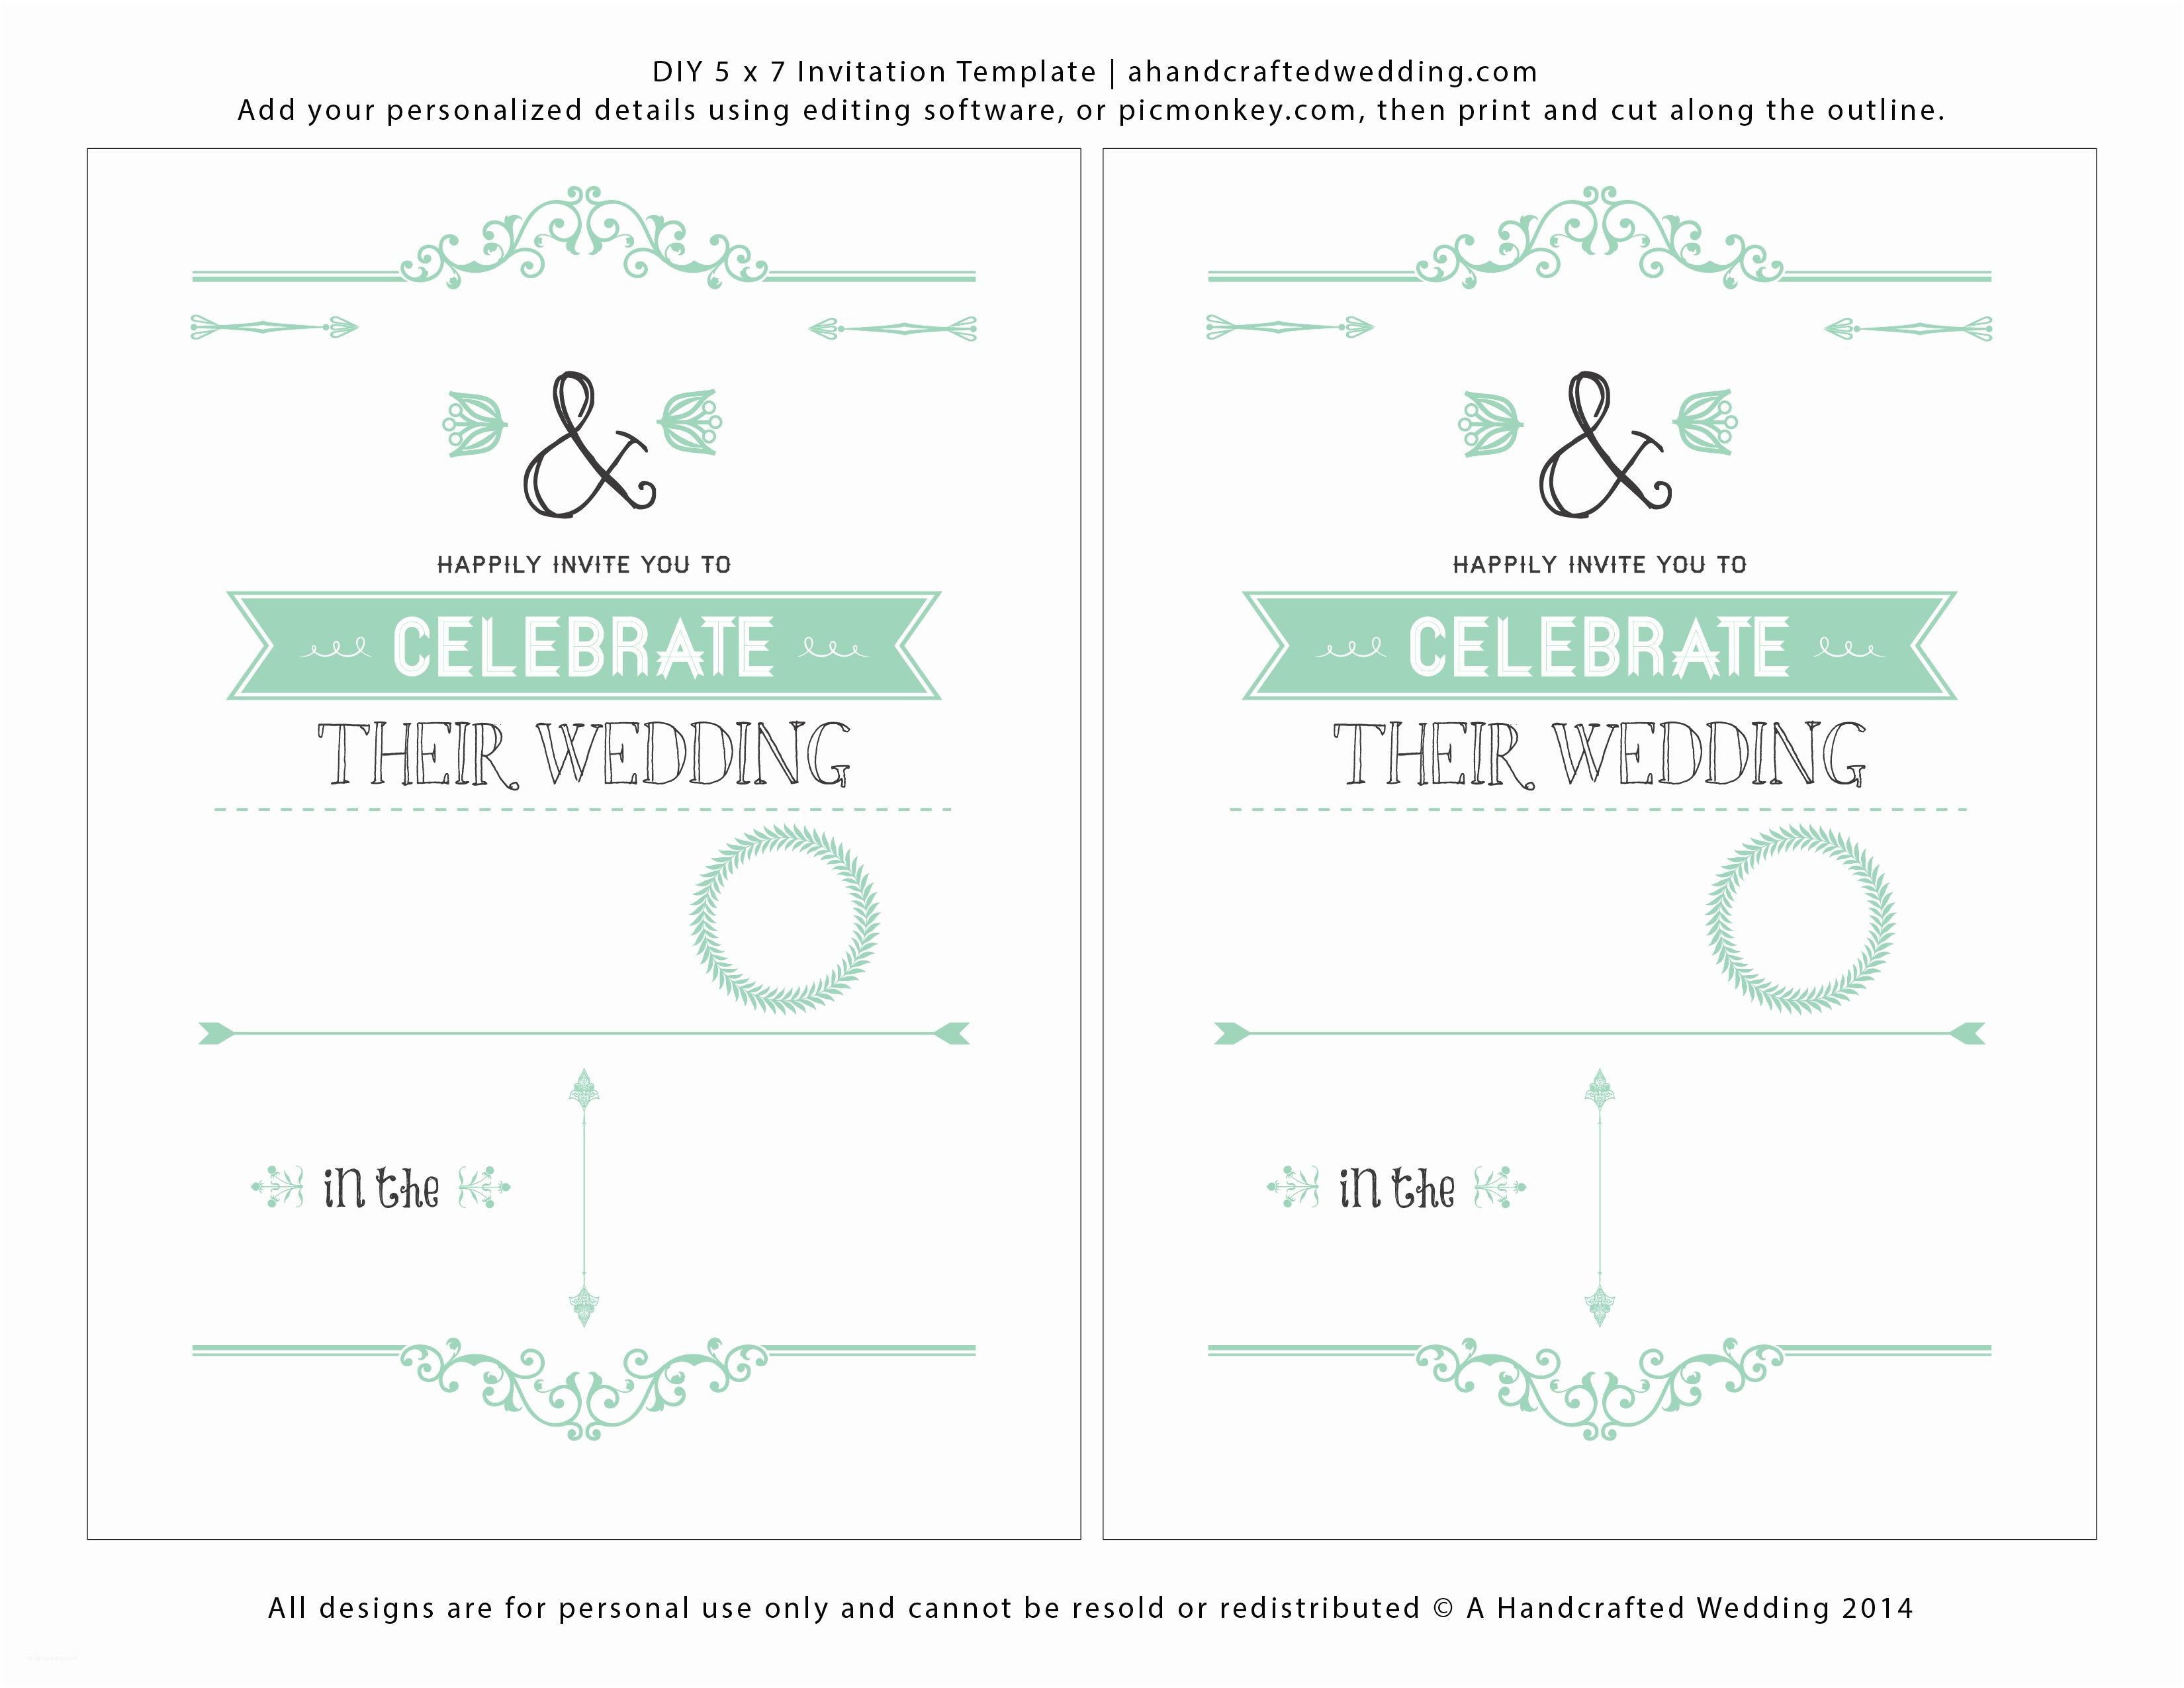 How to Print Wedding Invitations Free Wedding Invitations Templates